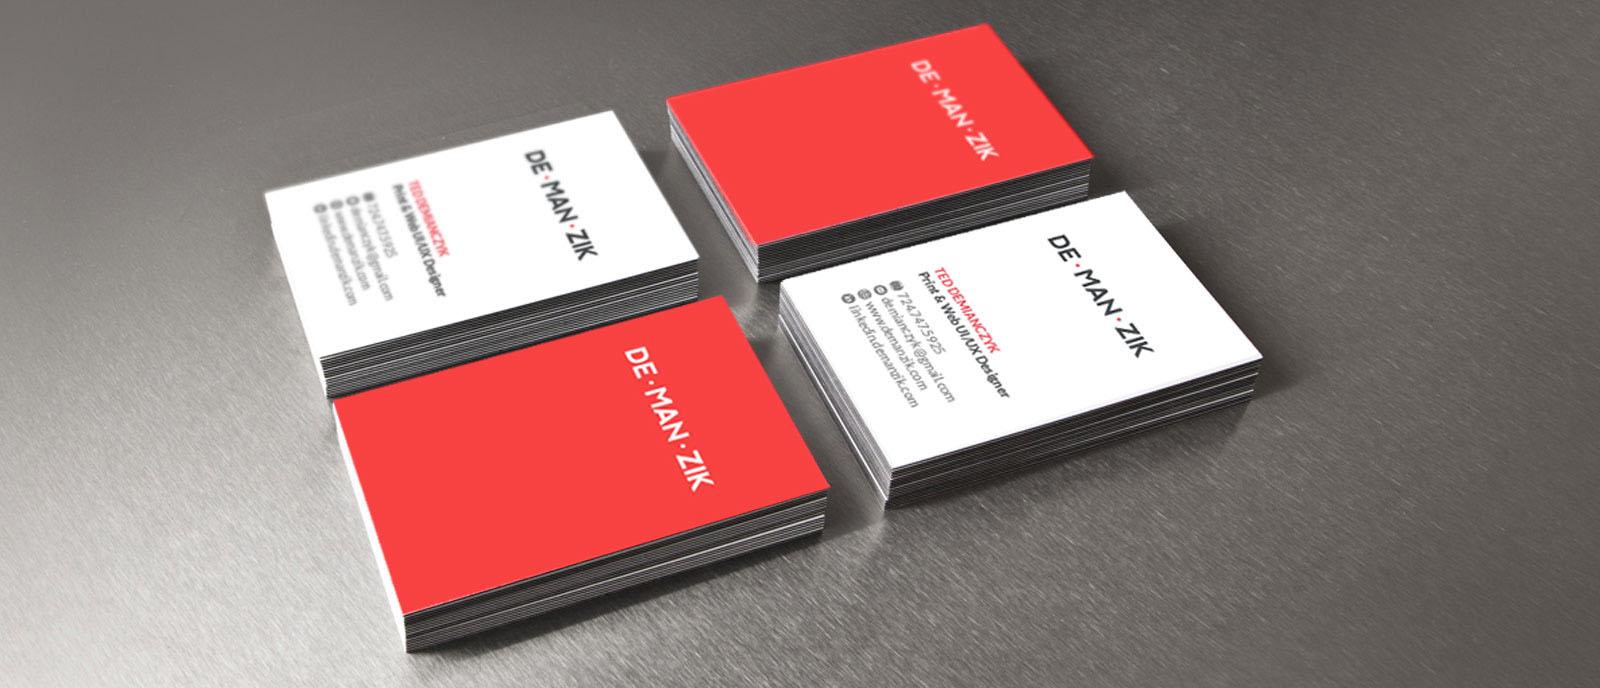 template_cards copy